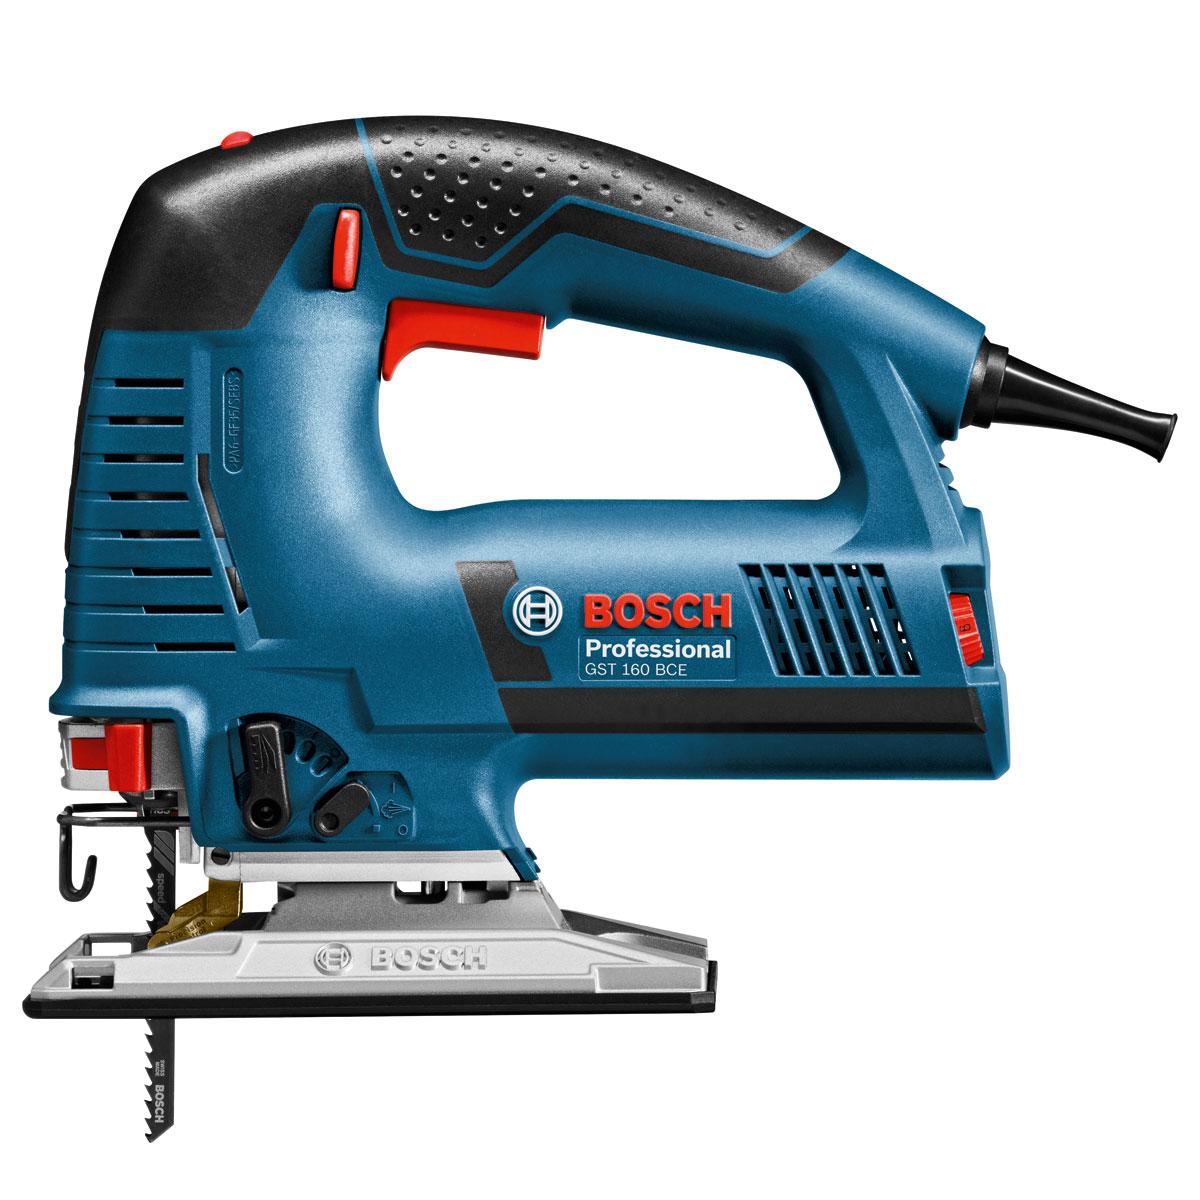 Лобзик Bosch 601518001 gst 160 bce (0.601.518.001) лобзик электрический gst 8000 e 710 вт bosch